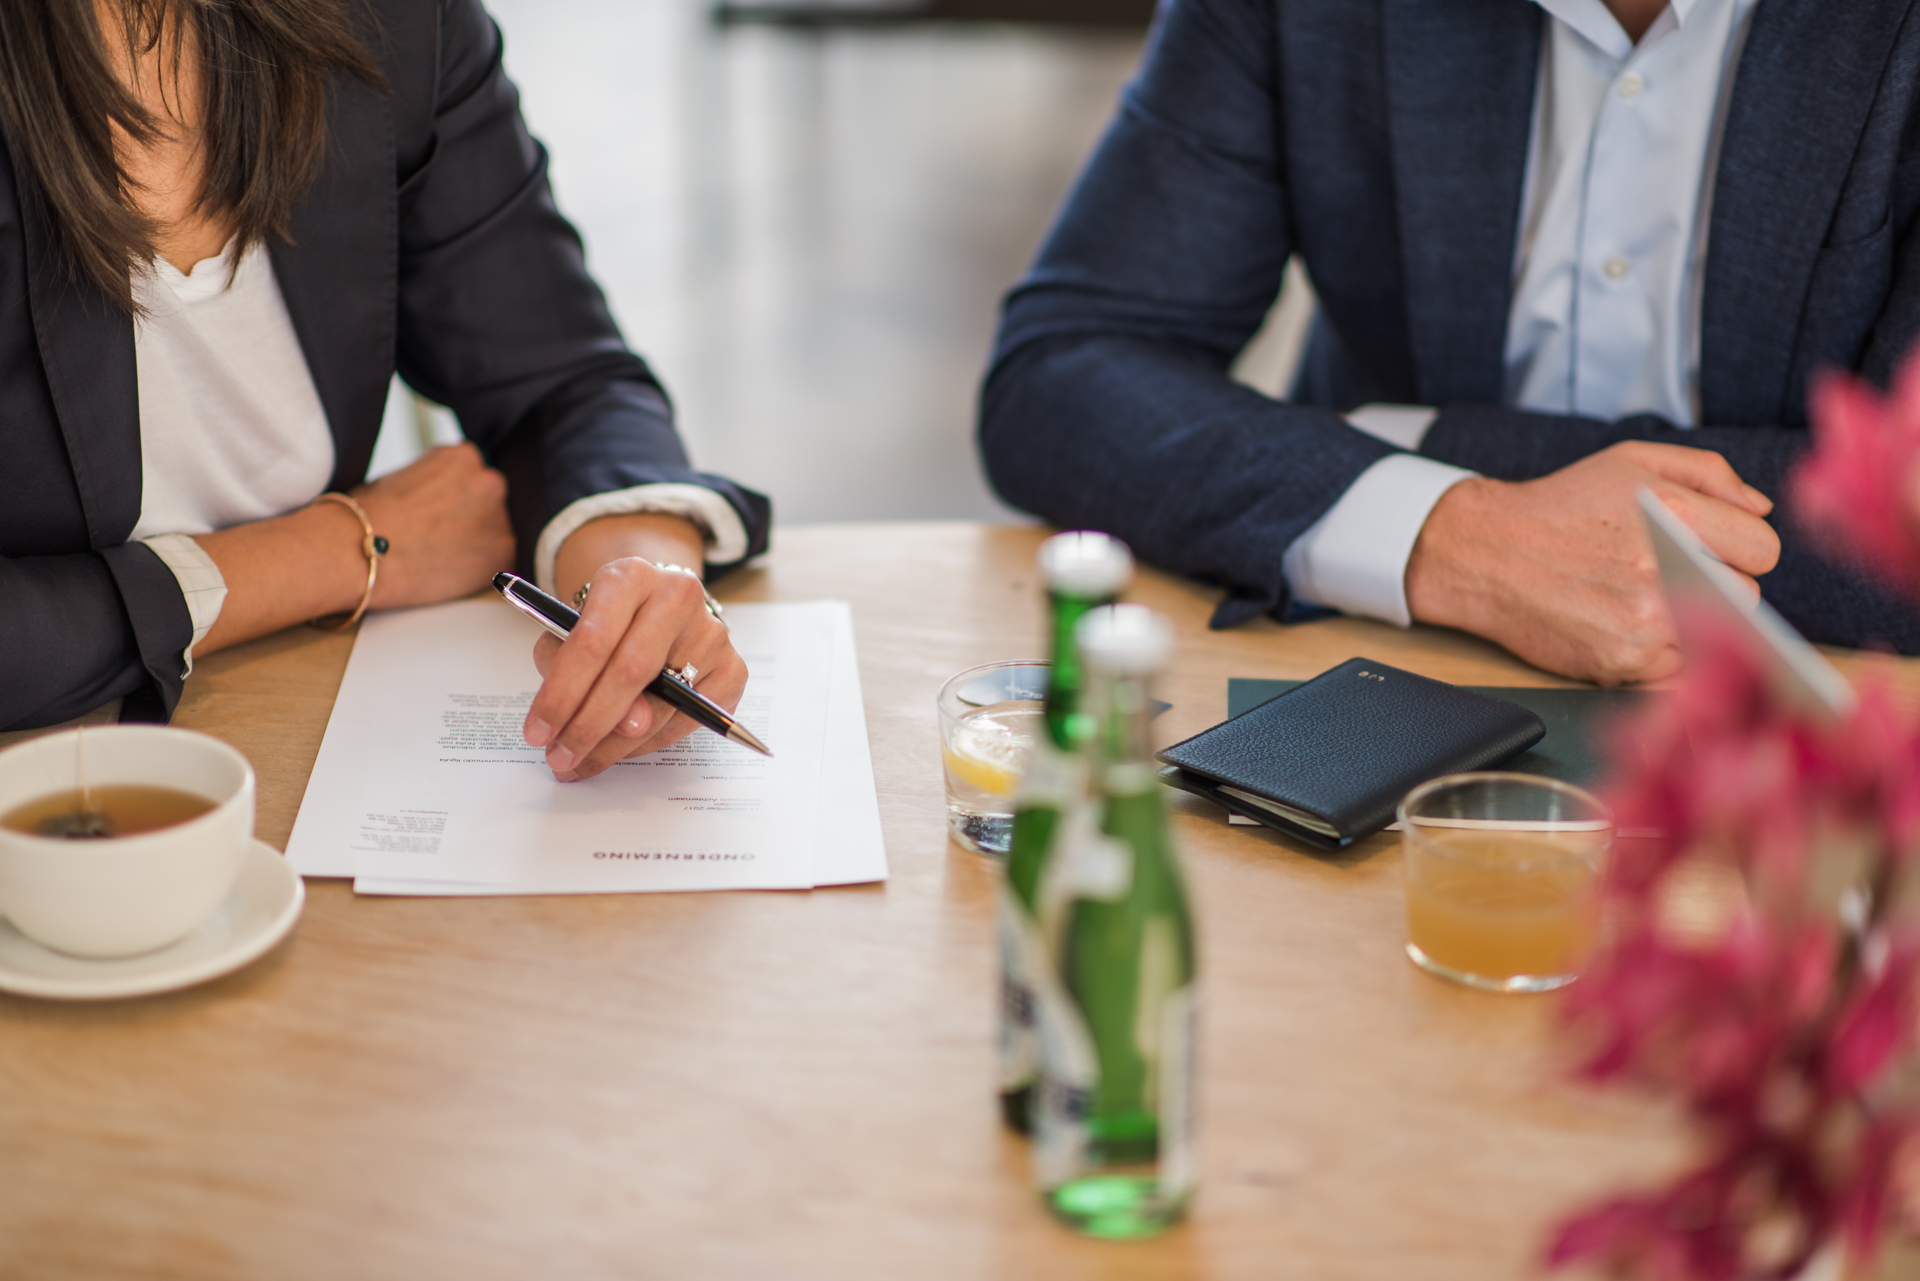 Beëindigings Vergoeding Werknemer Vs Werkgever | Arbeid Advocaten